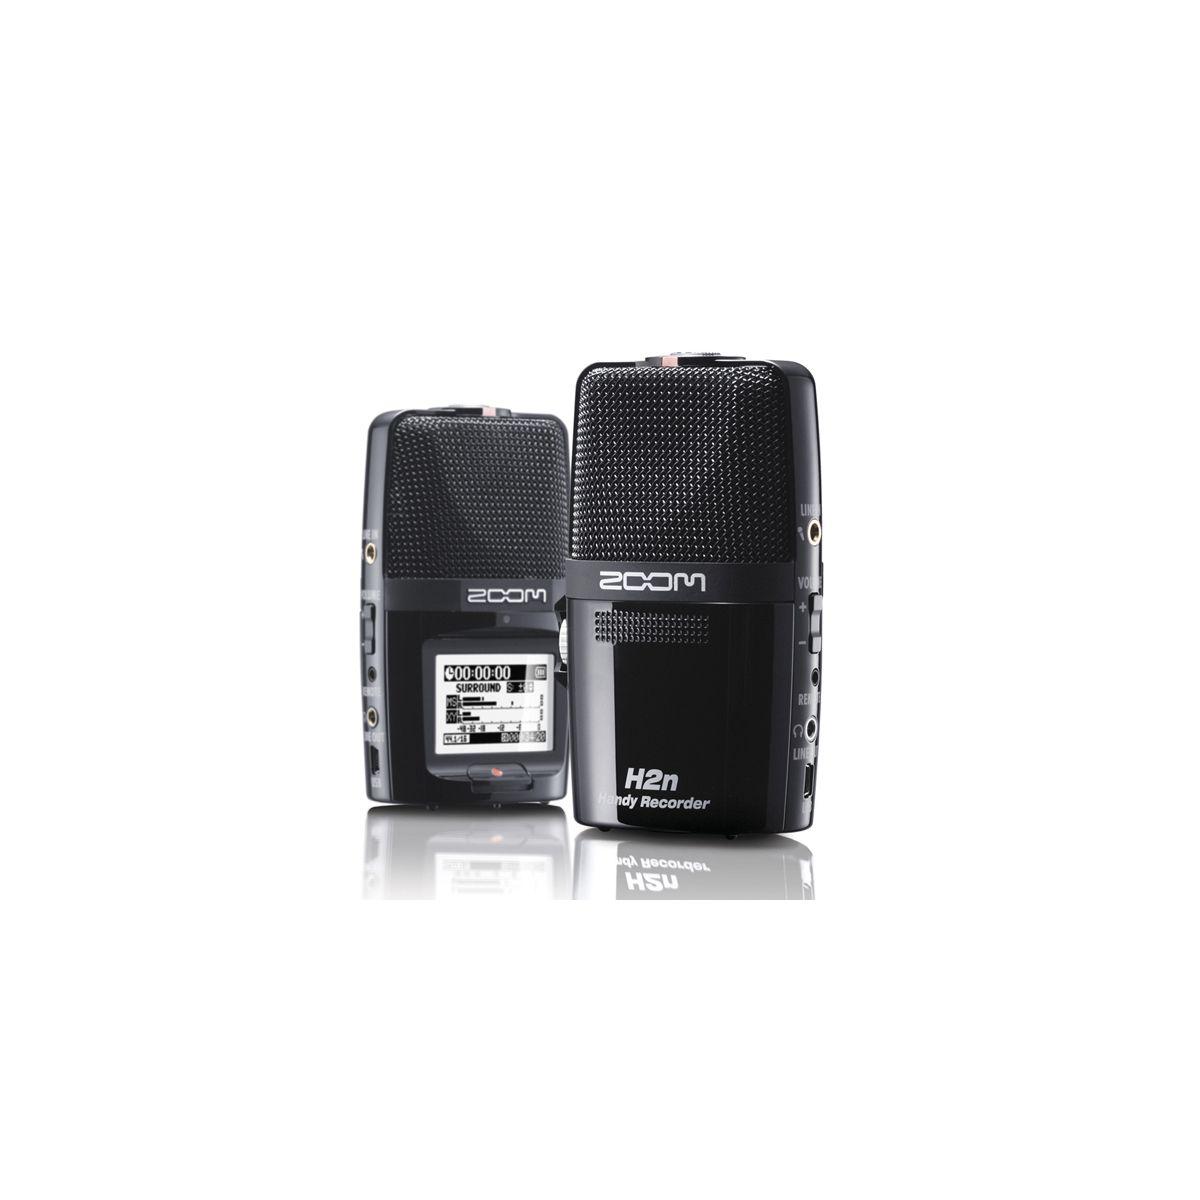 Enregistreurs portables - Zoom - H2n